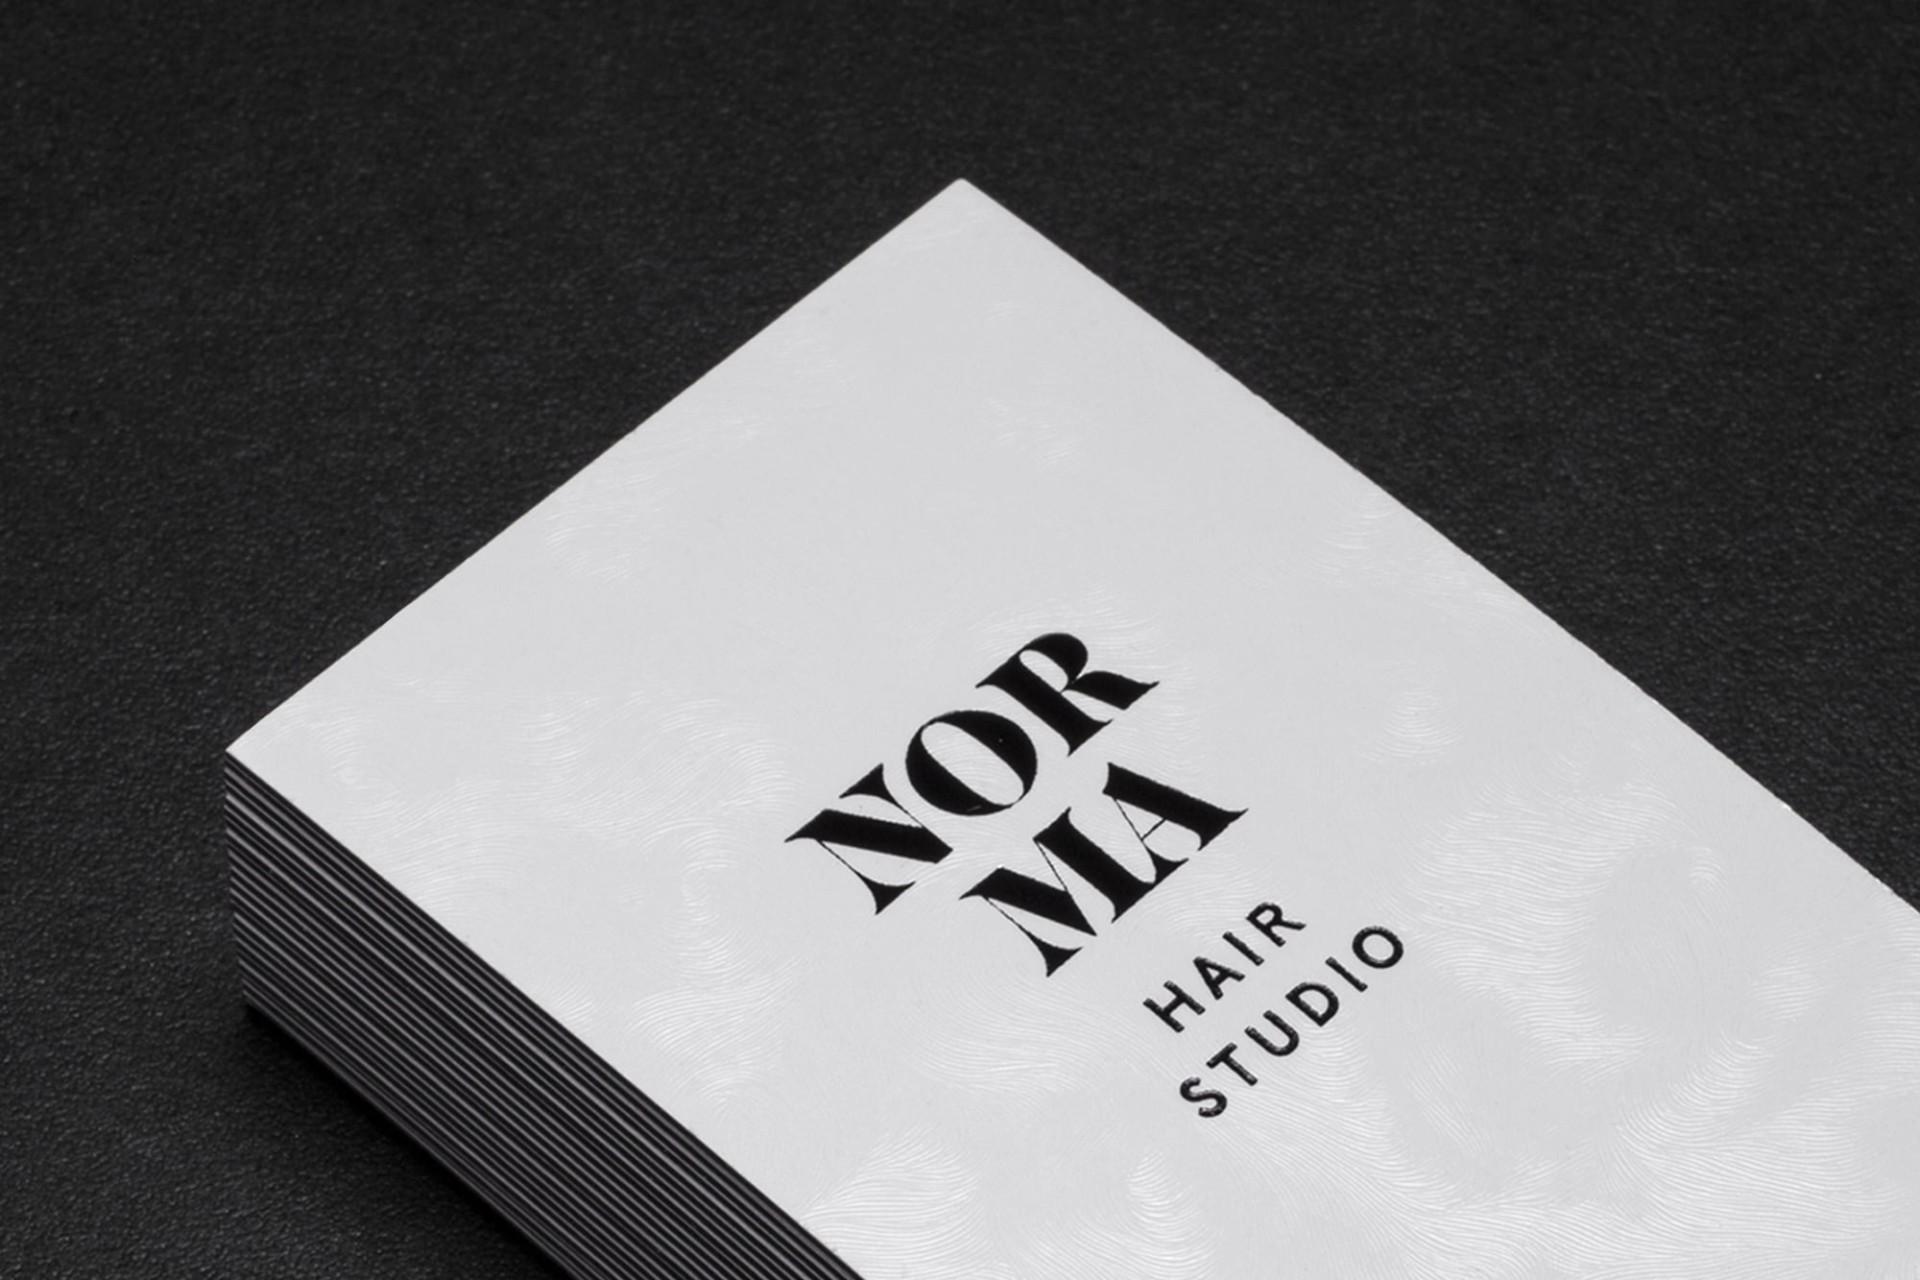 Eremo Norma Hair Studio